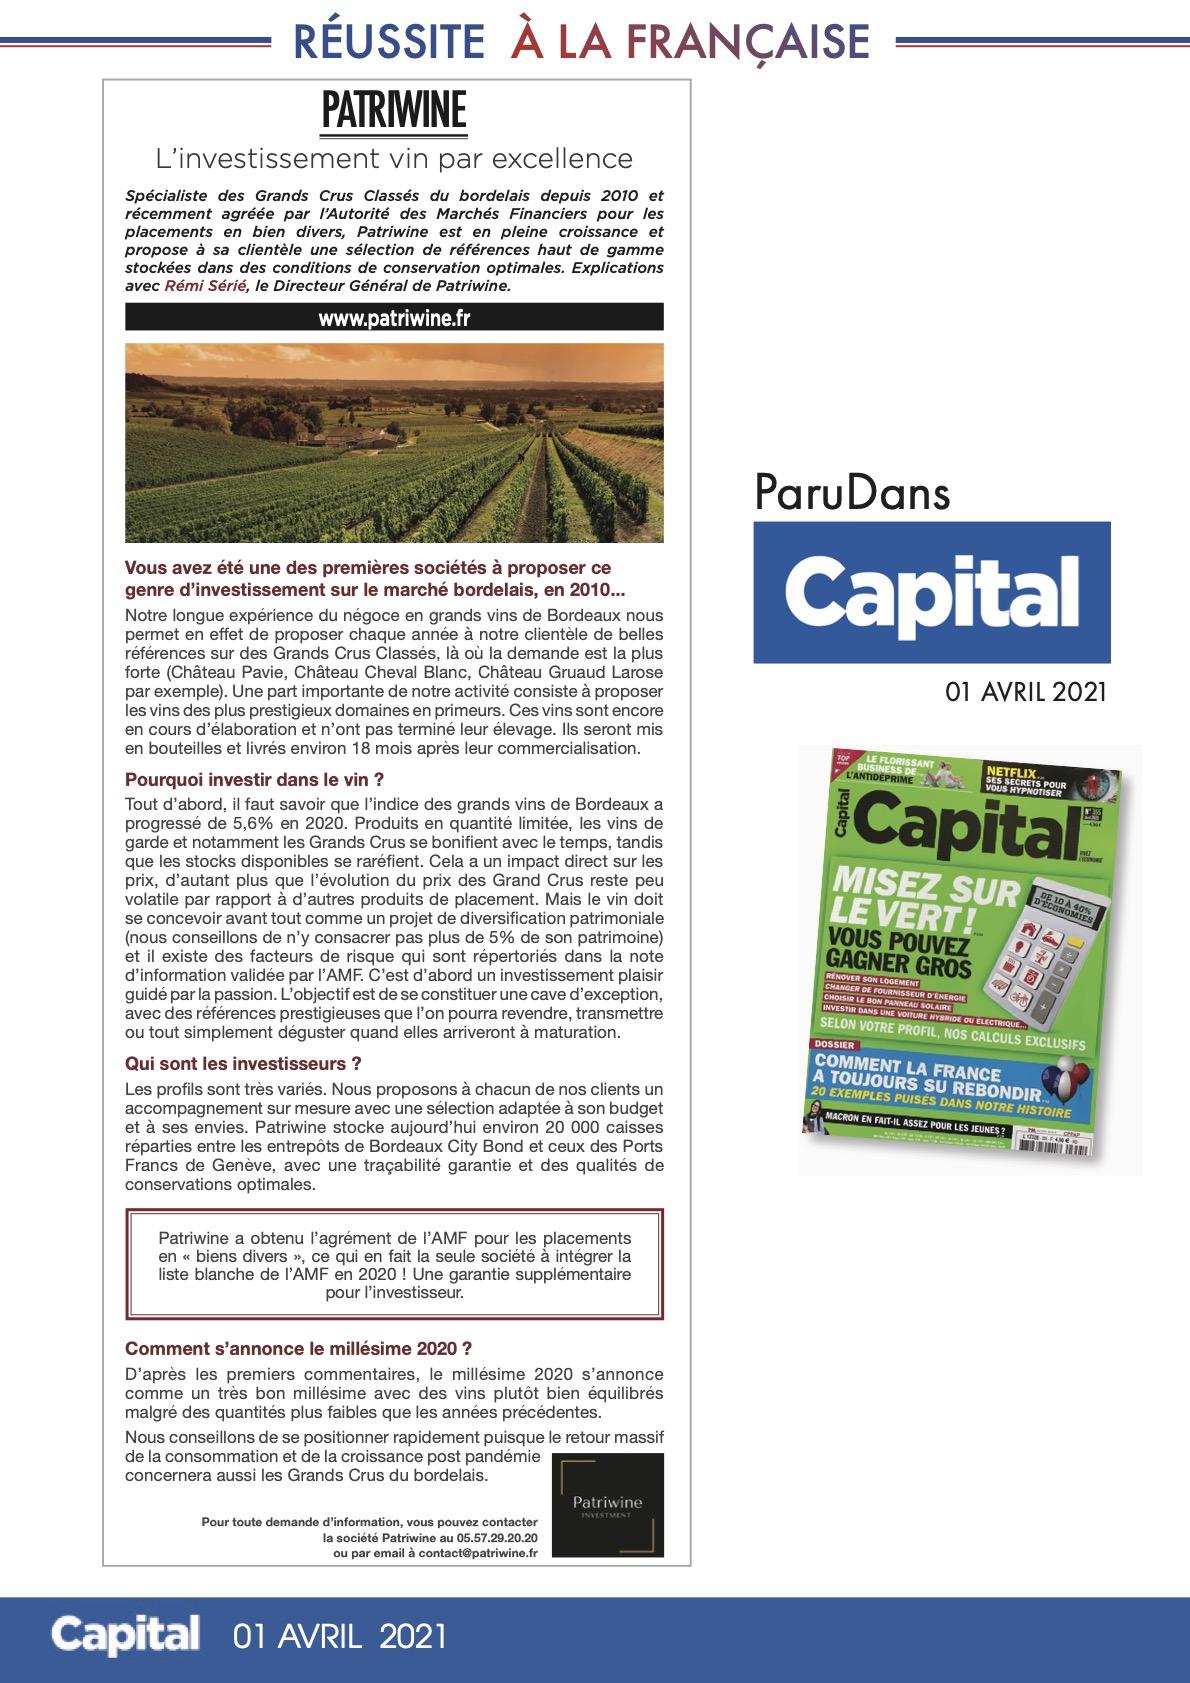 PATRIWINE - Capital